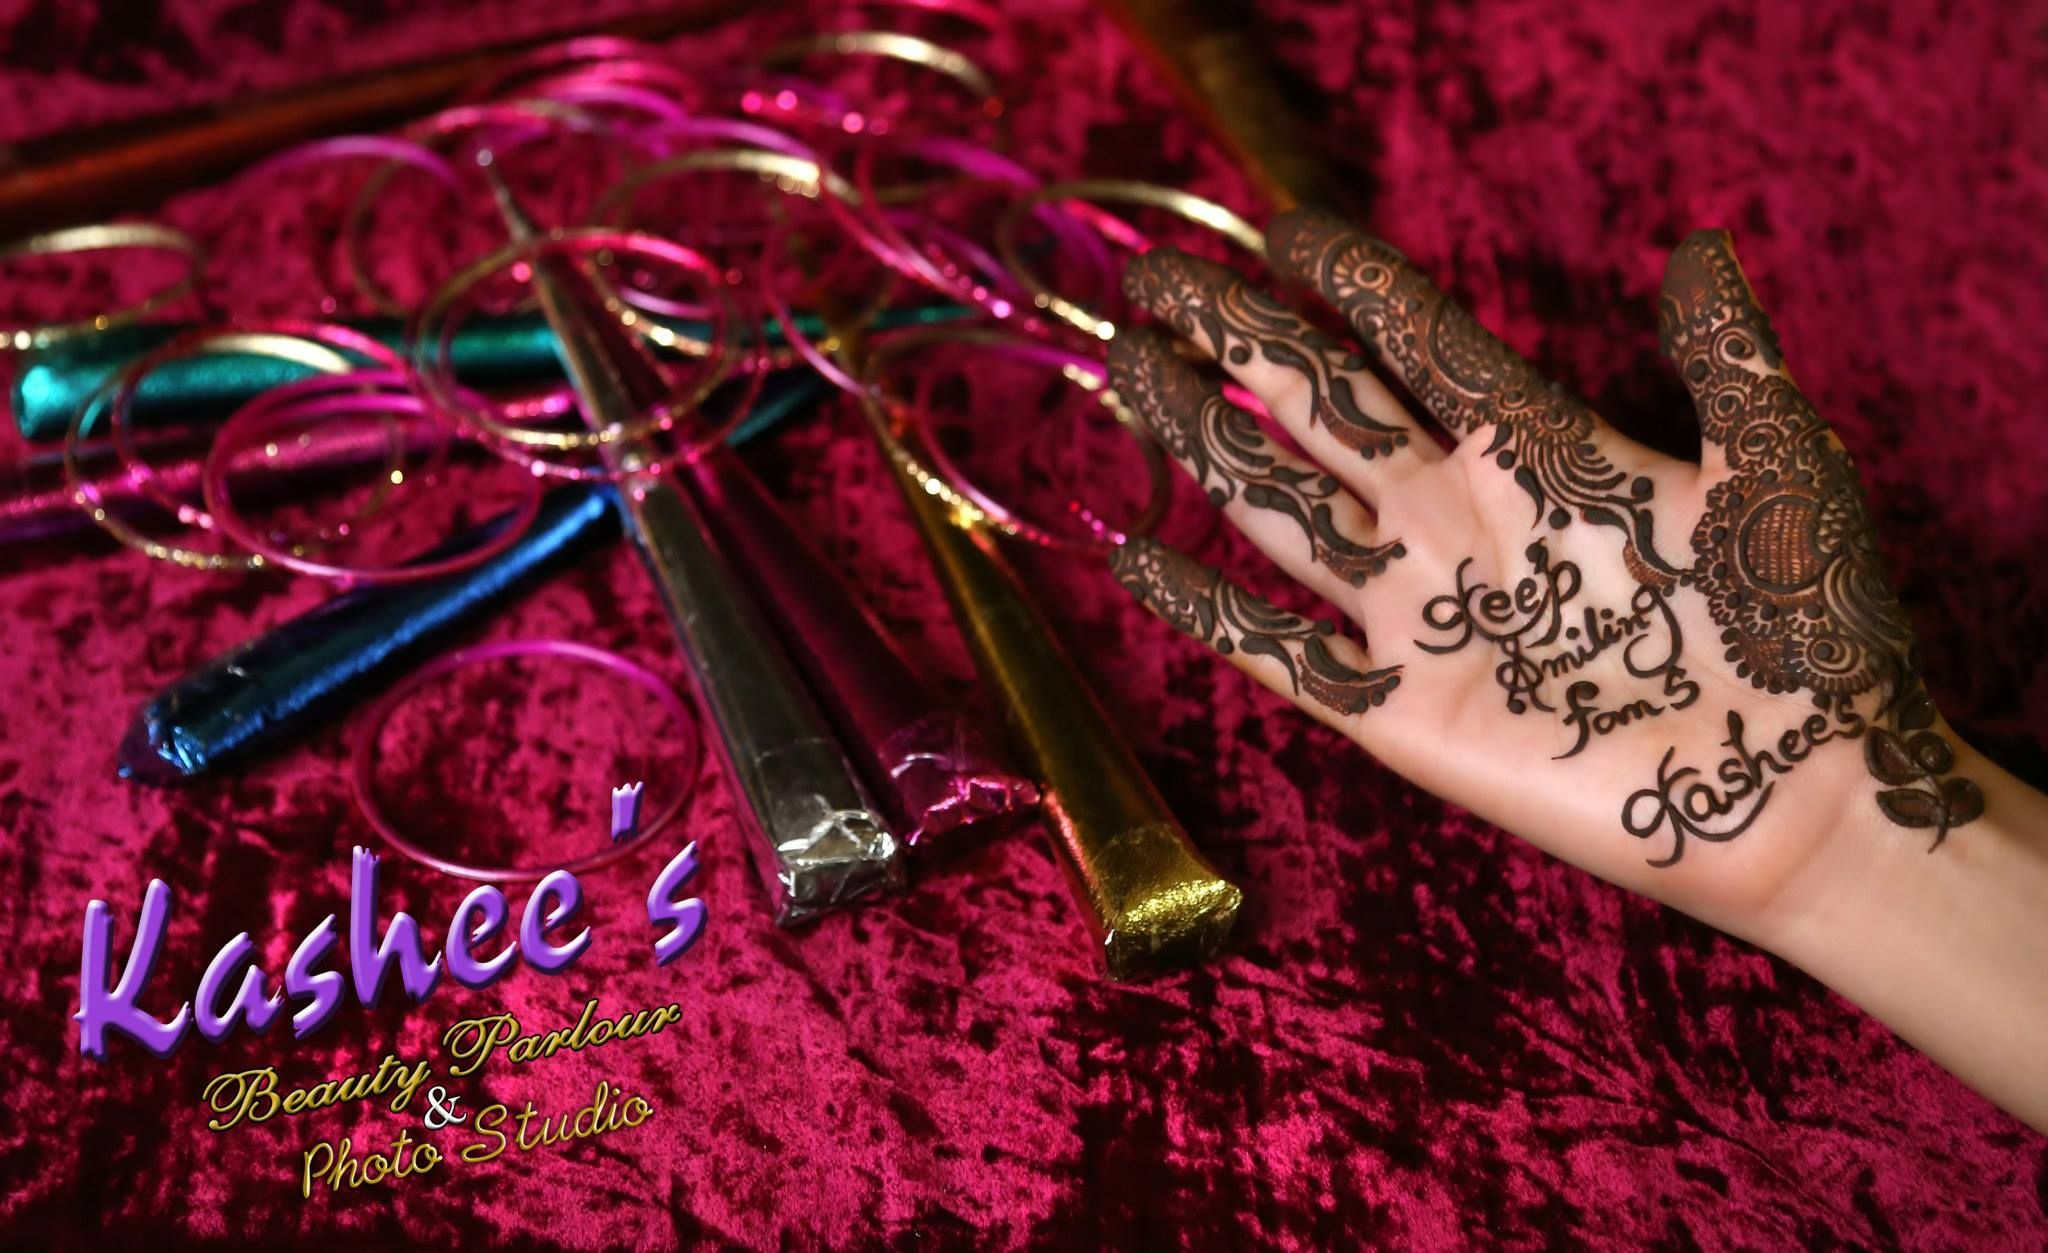 Kashee S Mehndi Makeup : Stylish mehndi designs collection  by kashee artist salon